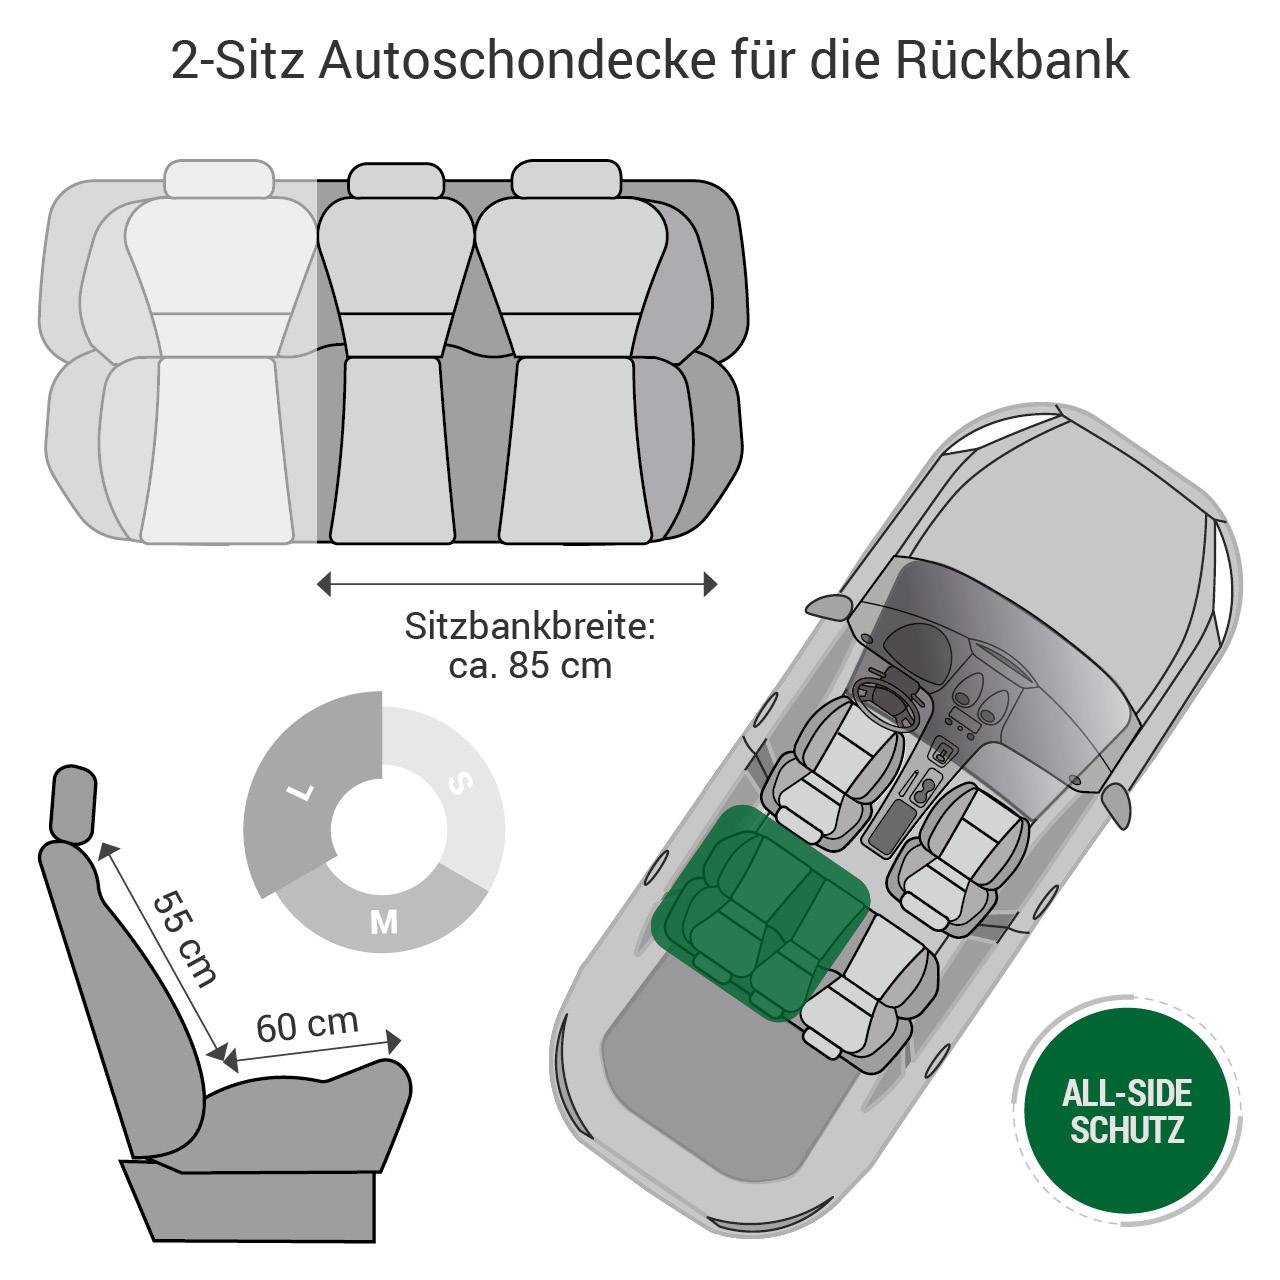 Doctor Bark - Autoschondecke für Hunde - Rückbank 2-Sitz Gr. L - braun